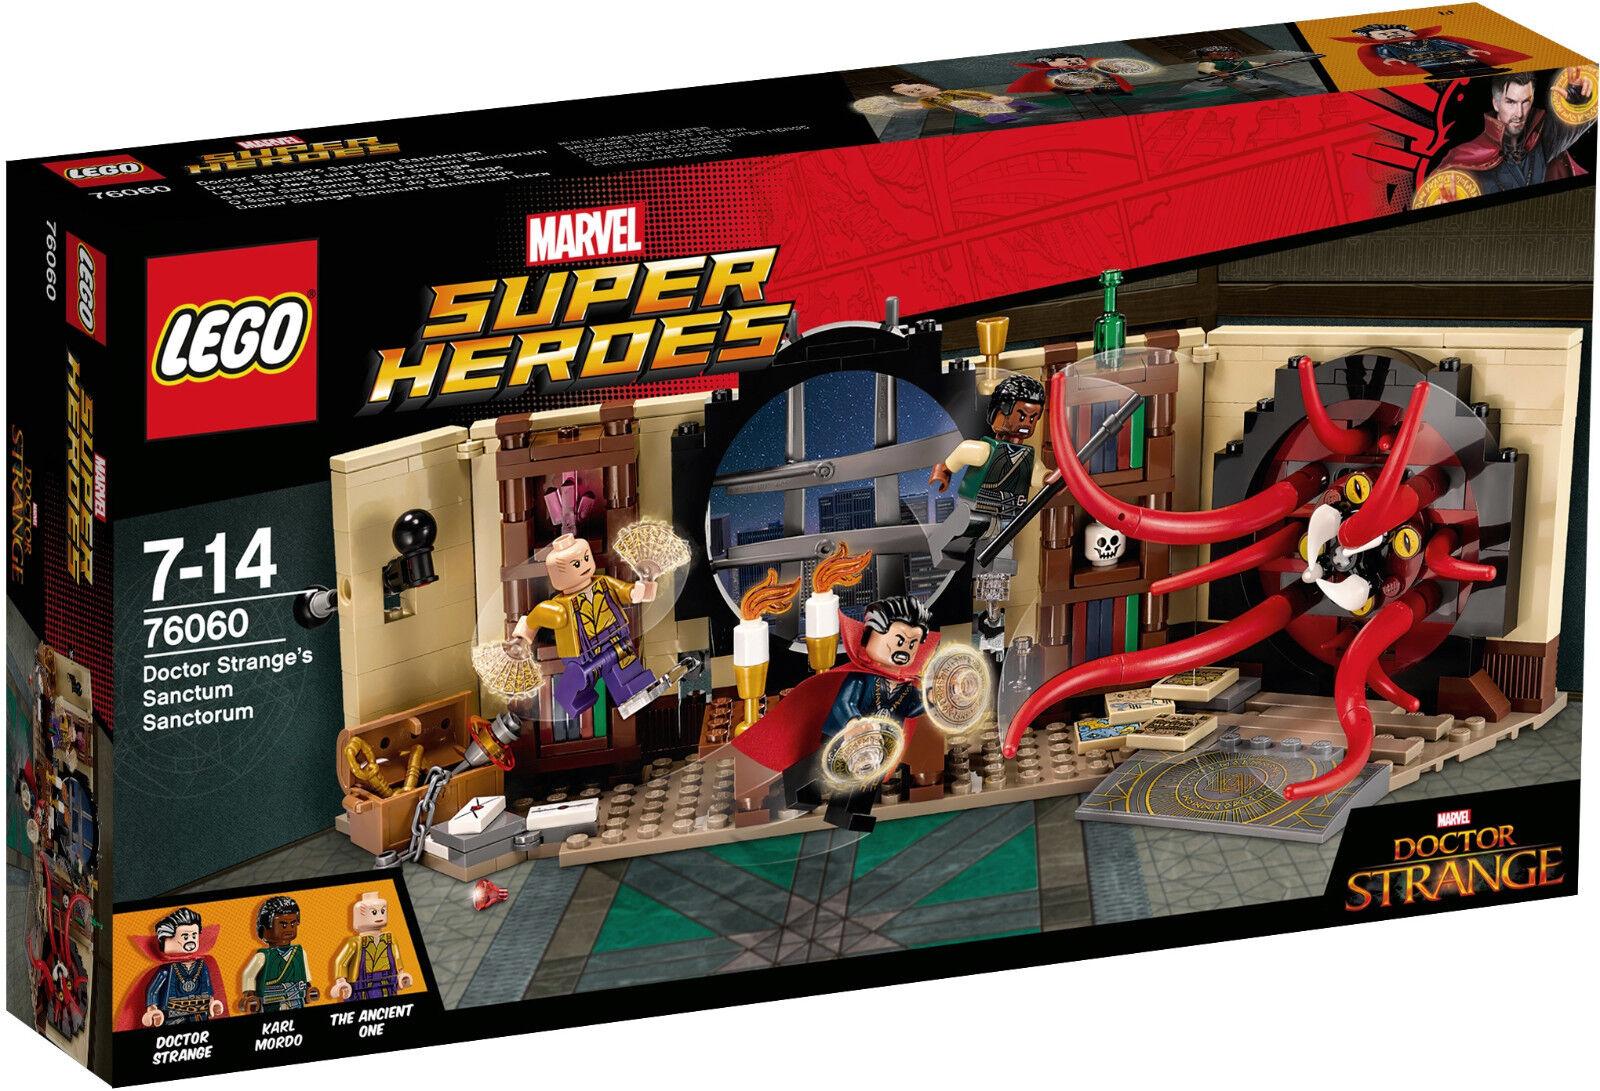 LEGO SUPER HEROES MARVEL DOCTOR STRANGE'S SANCTUM SANCTORUM 76060 - NUEVO